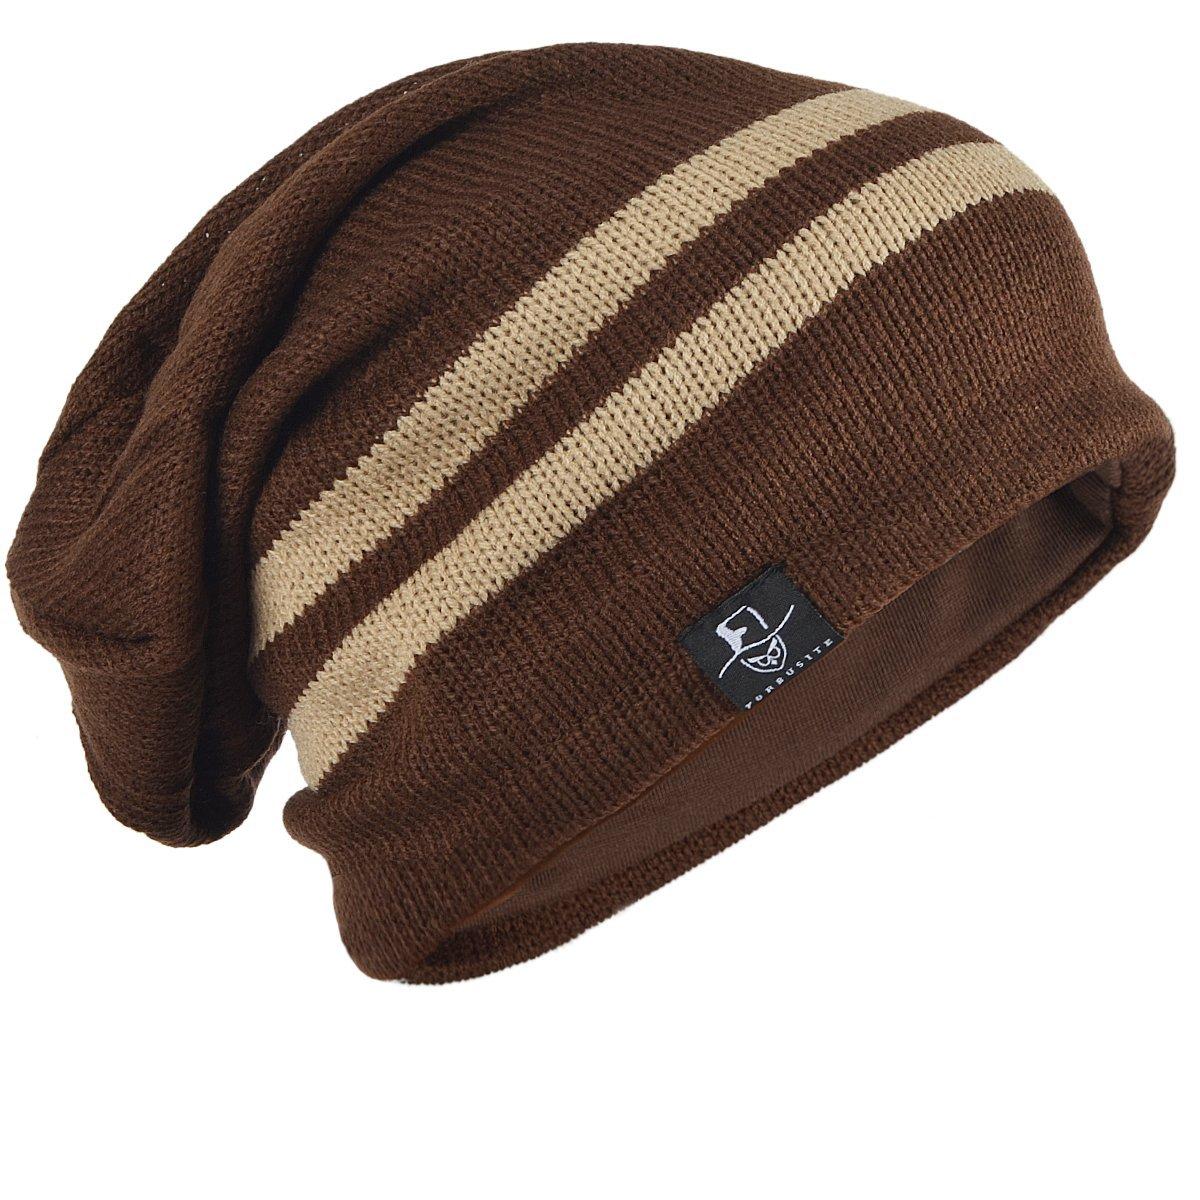 Vintage Men Baggy Beanie Slouchy Knit Skull Cap Hat (B318-Brown) at ...